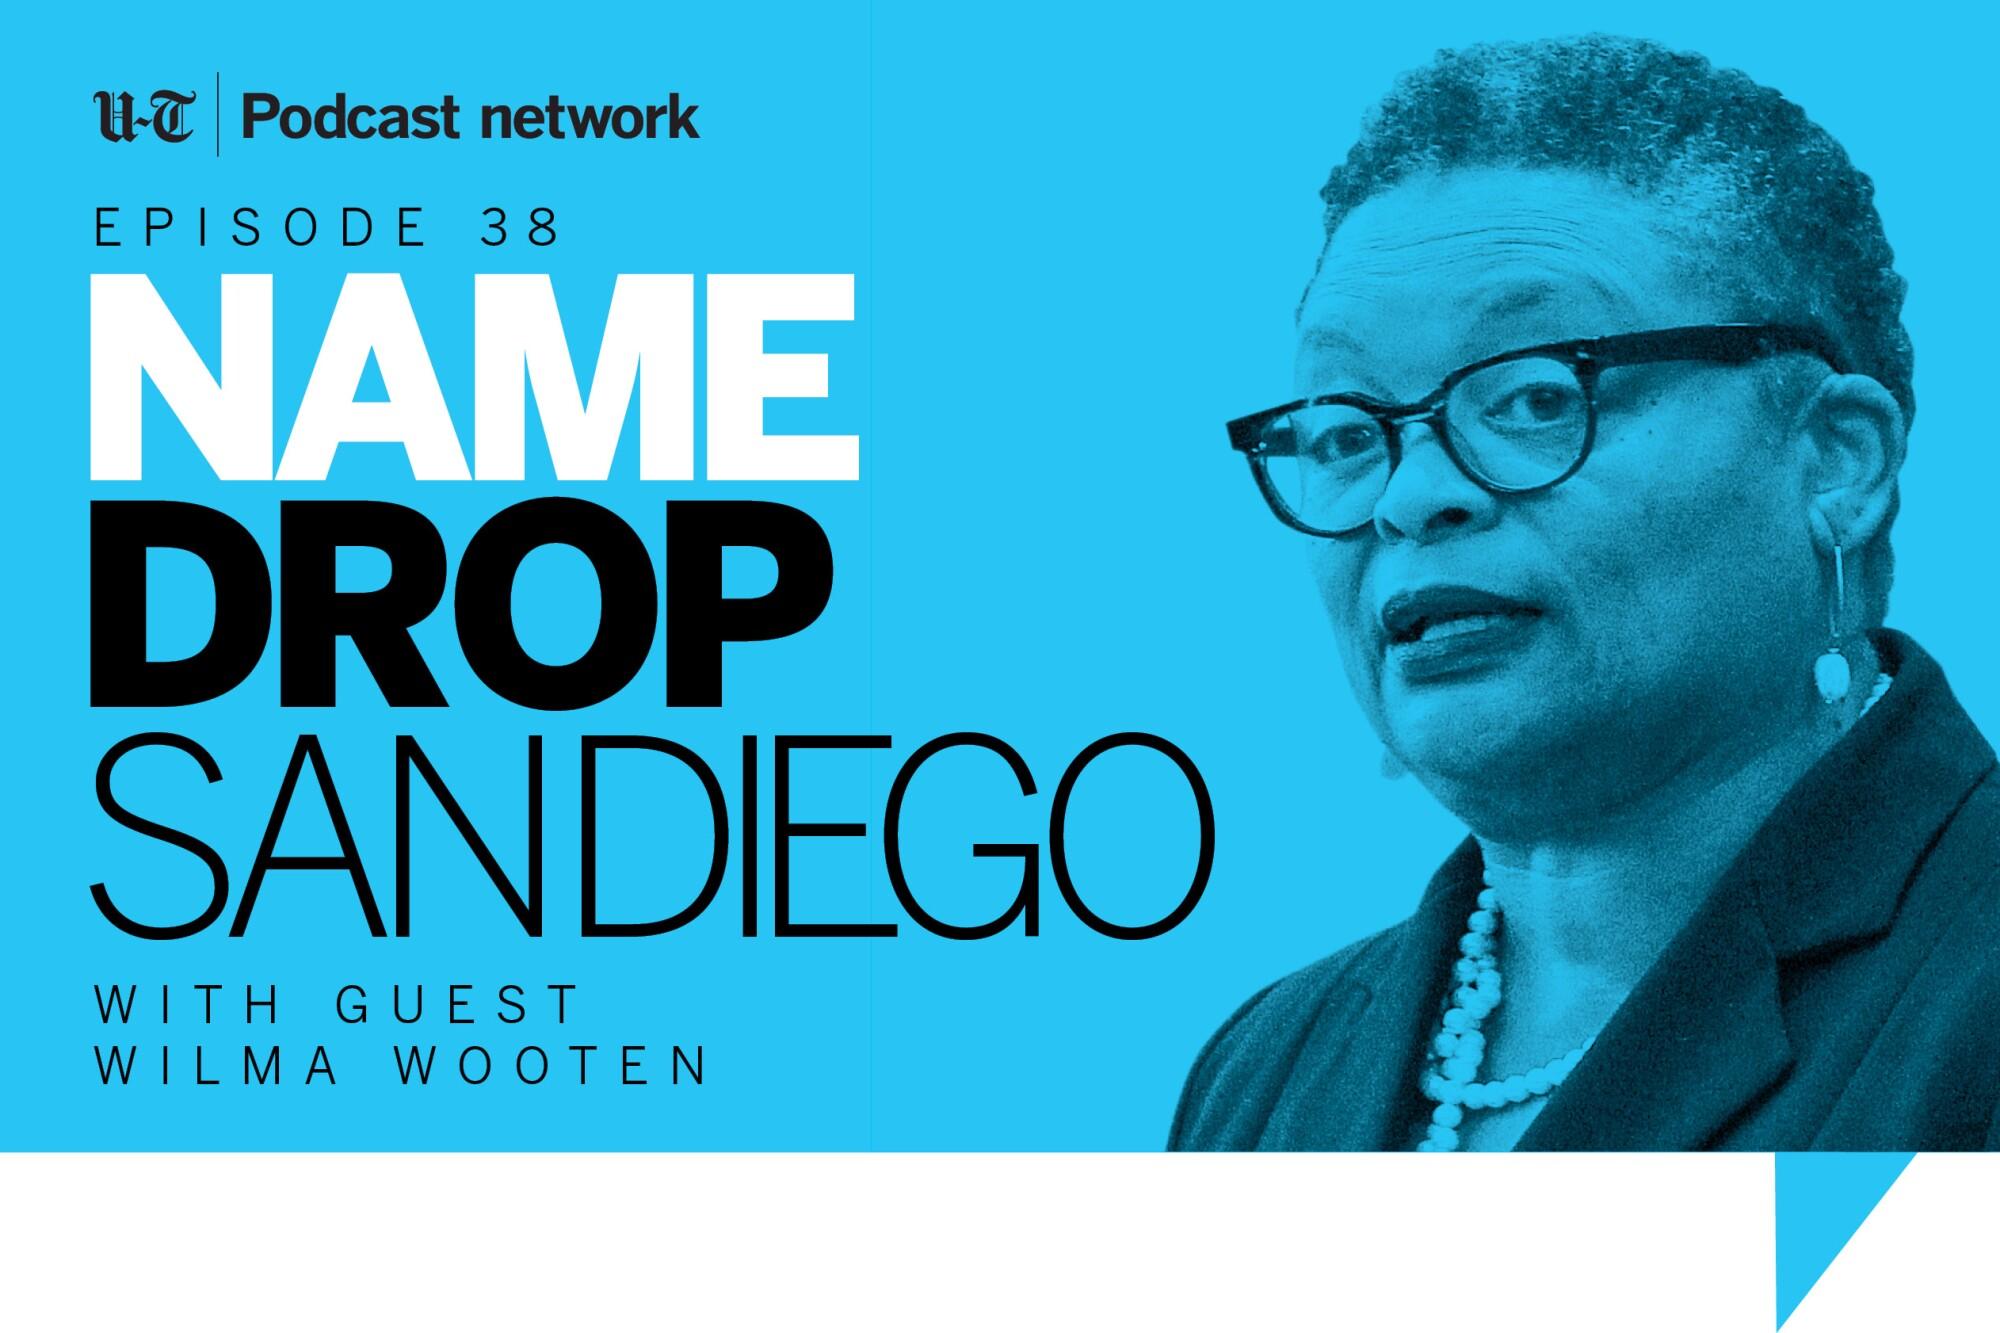 Dr. Wilma Wooten on Name Drop San Diego